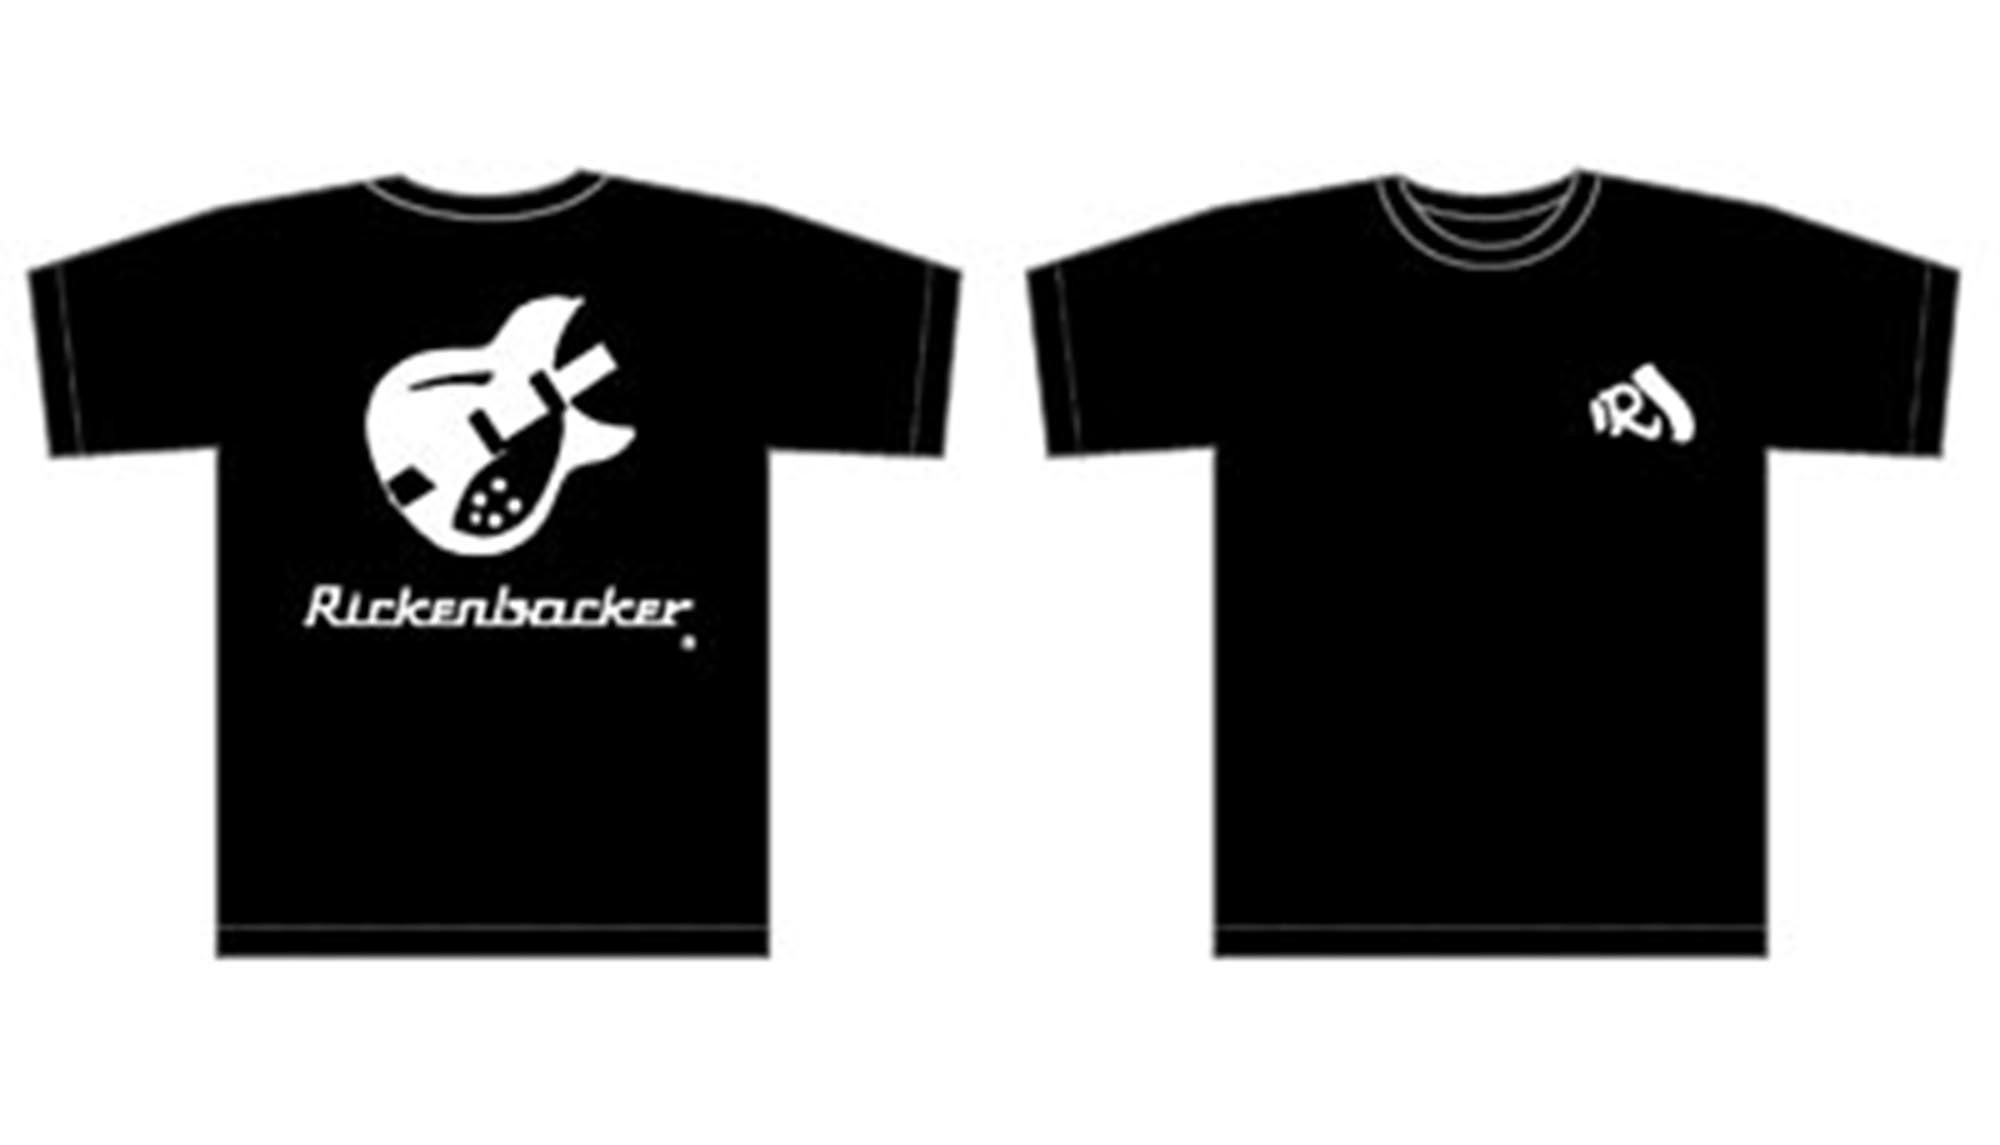 Rickenbacker Guitar T-Shirt - Large